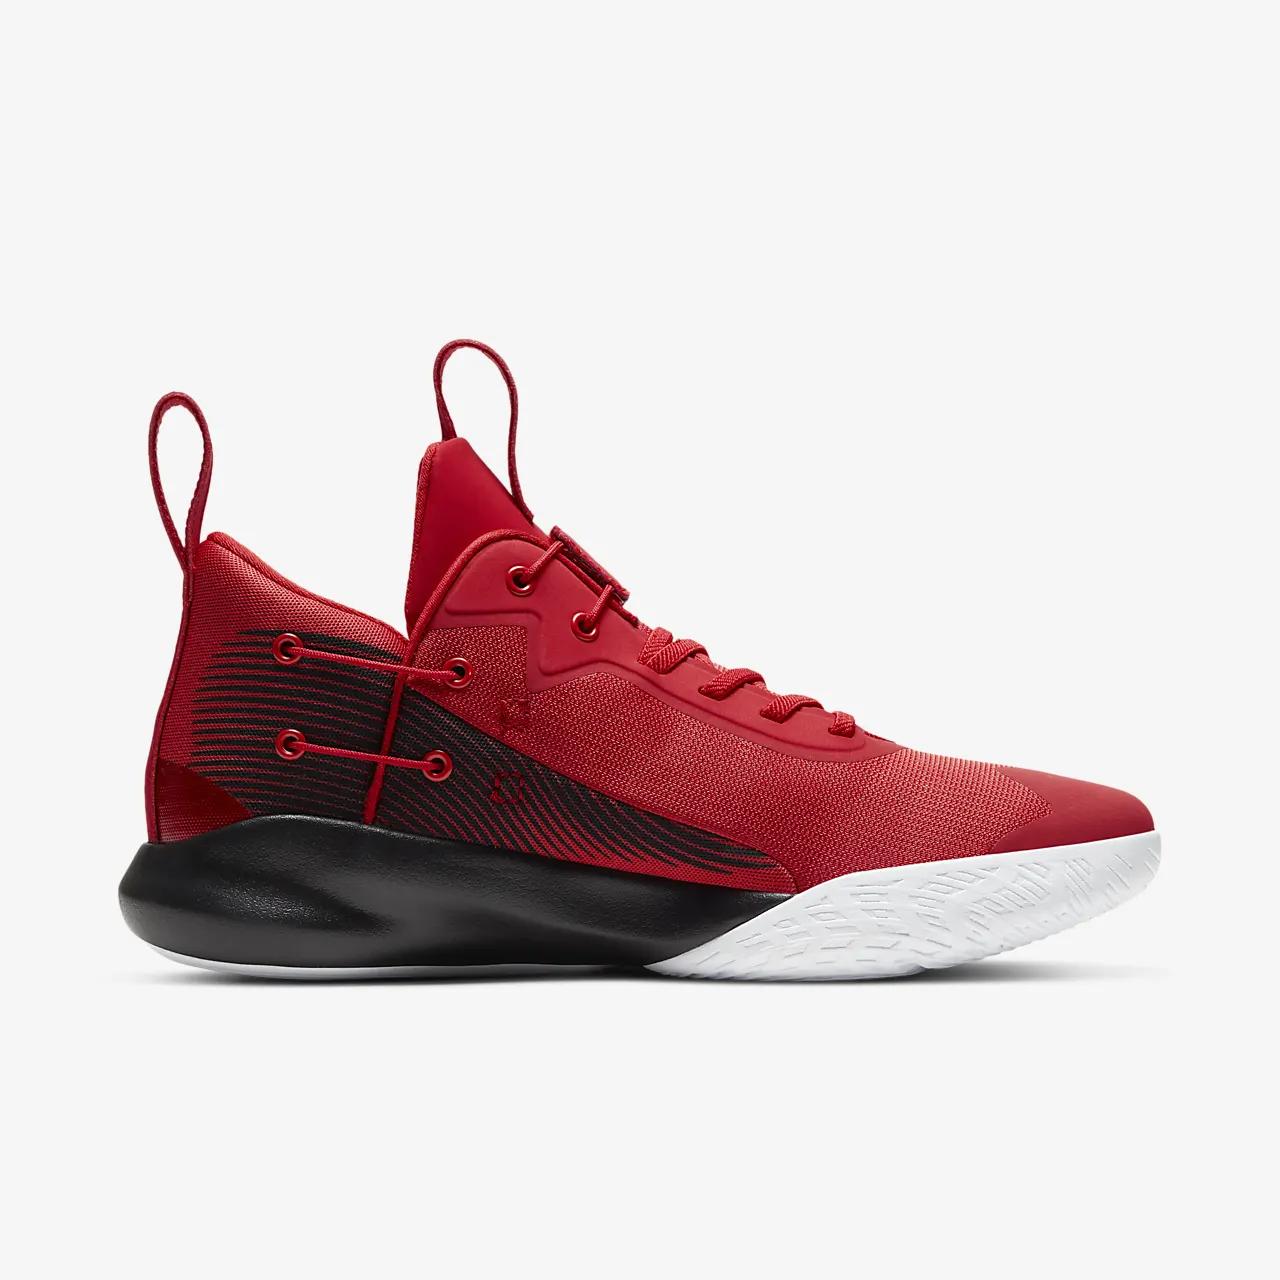 Nike Precision 4 FlyEase Basketball Shoe CV3450-600